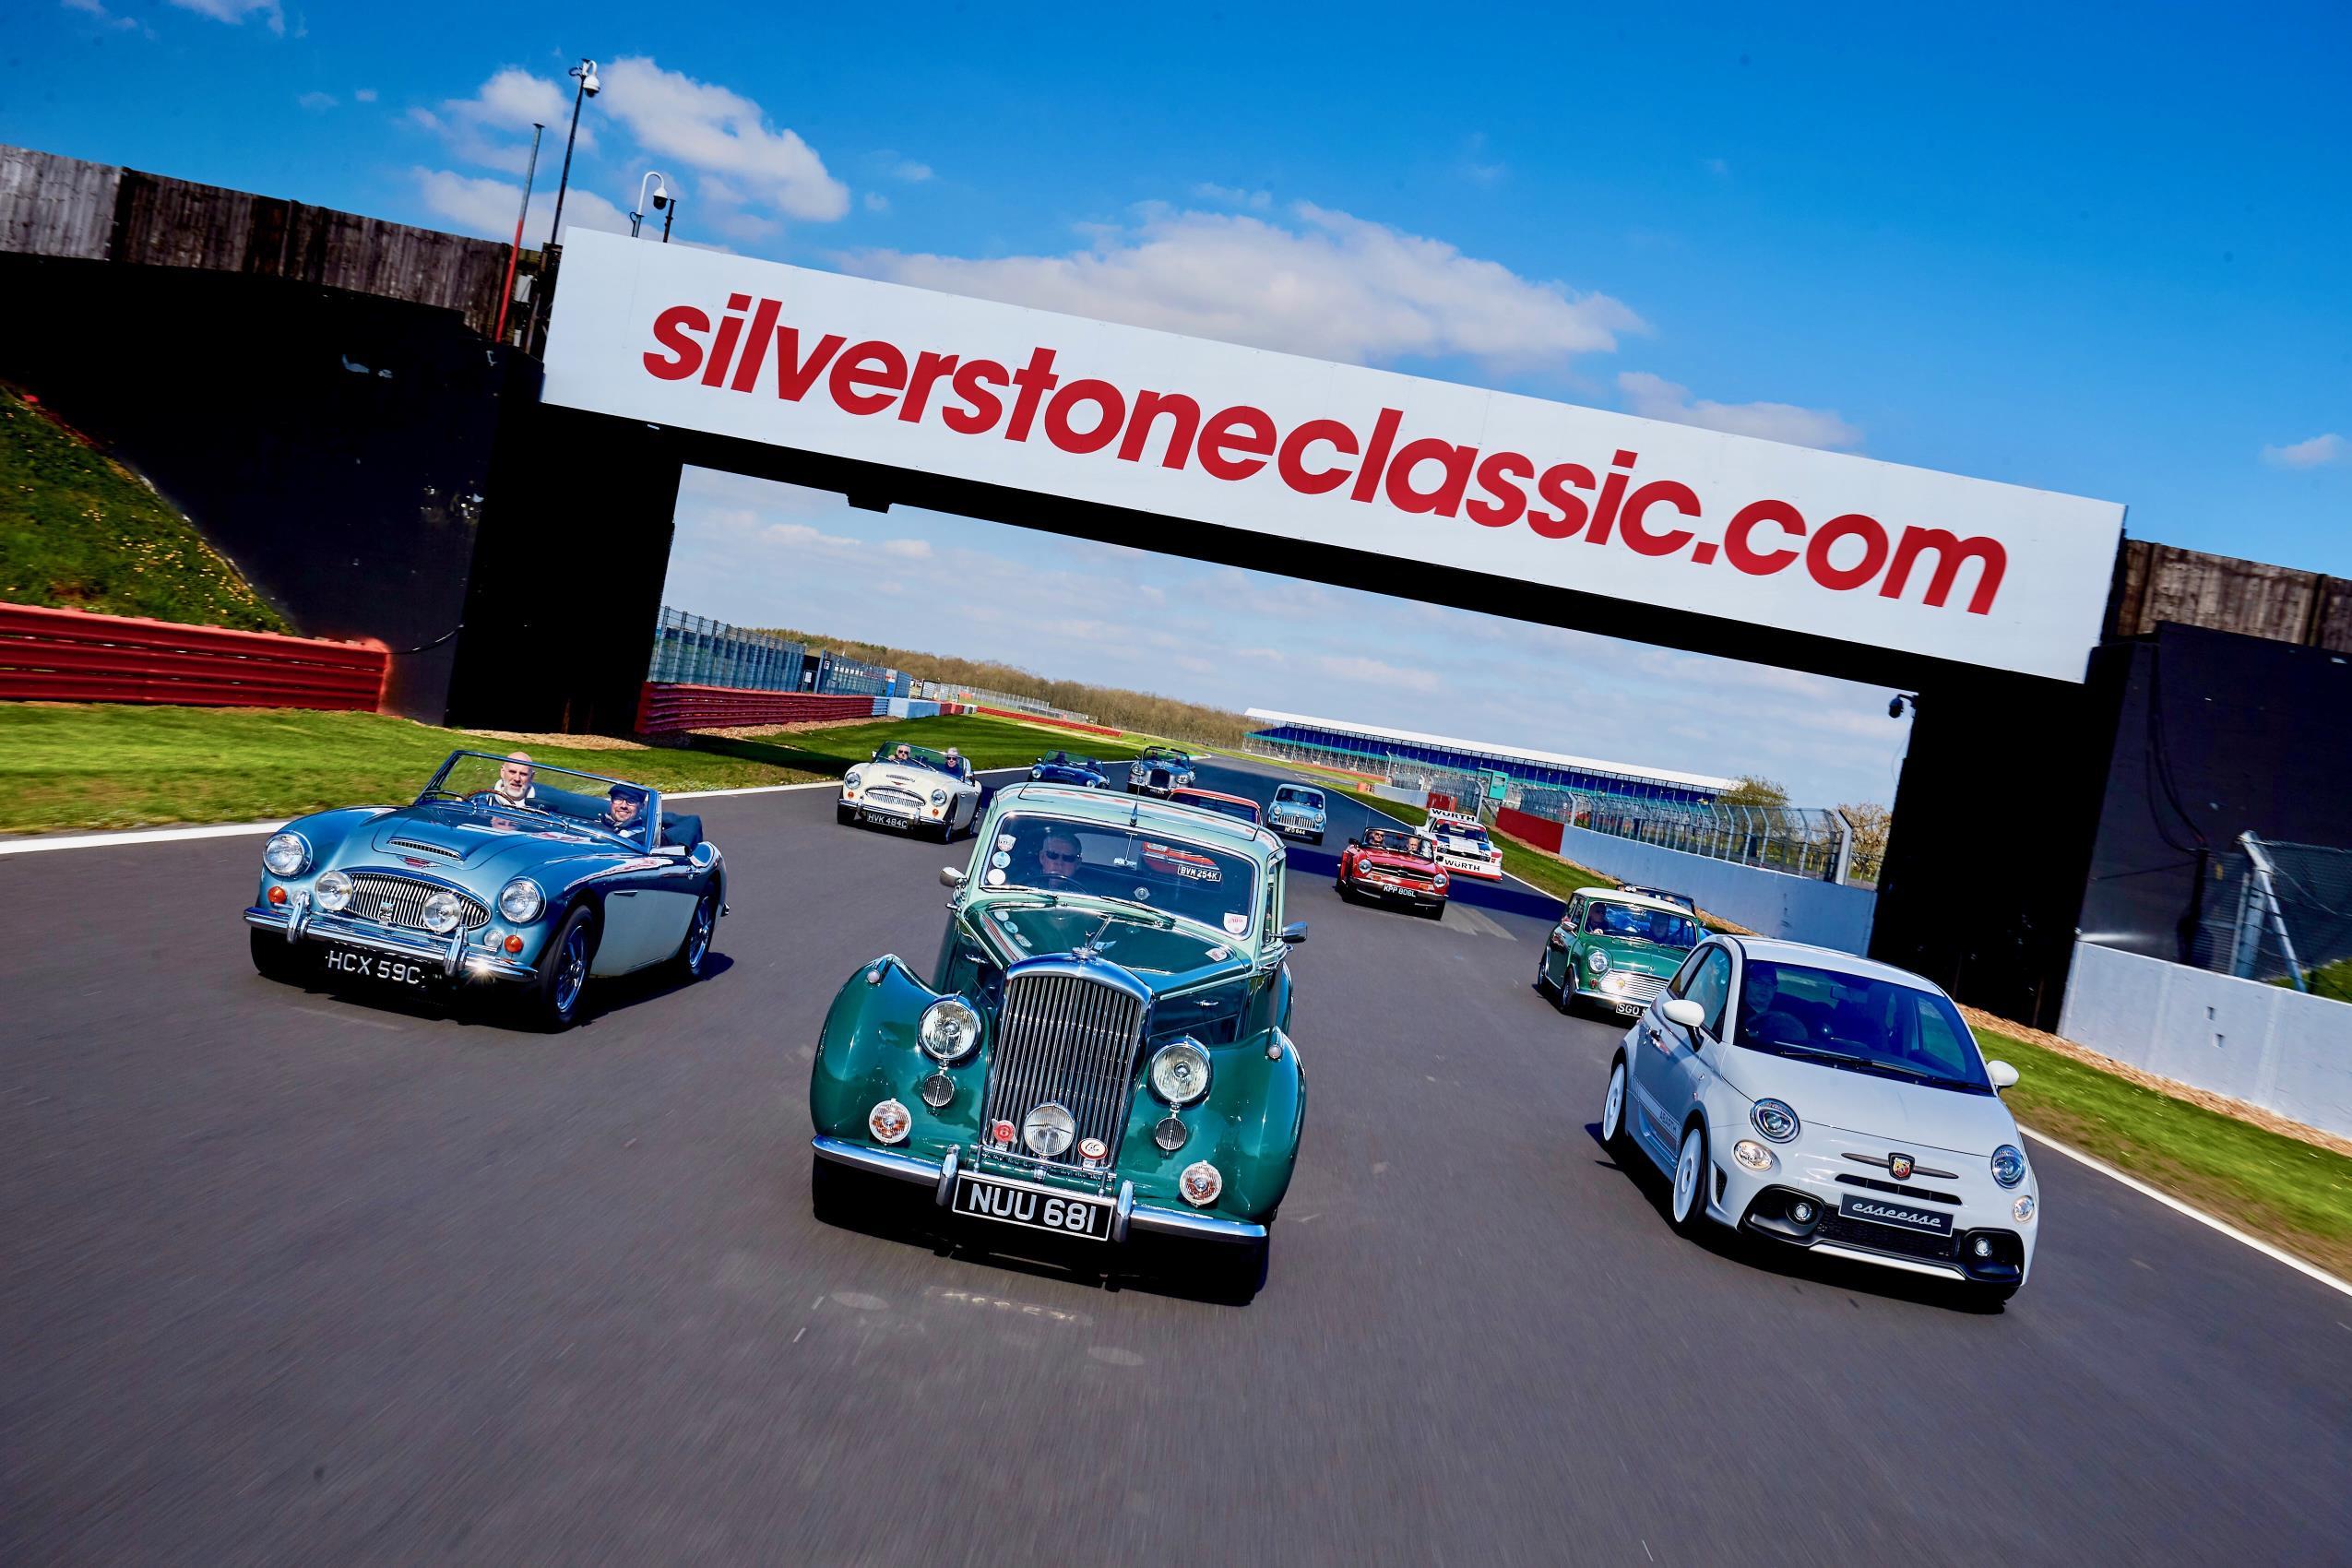 The 2019 Silverstone Classic